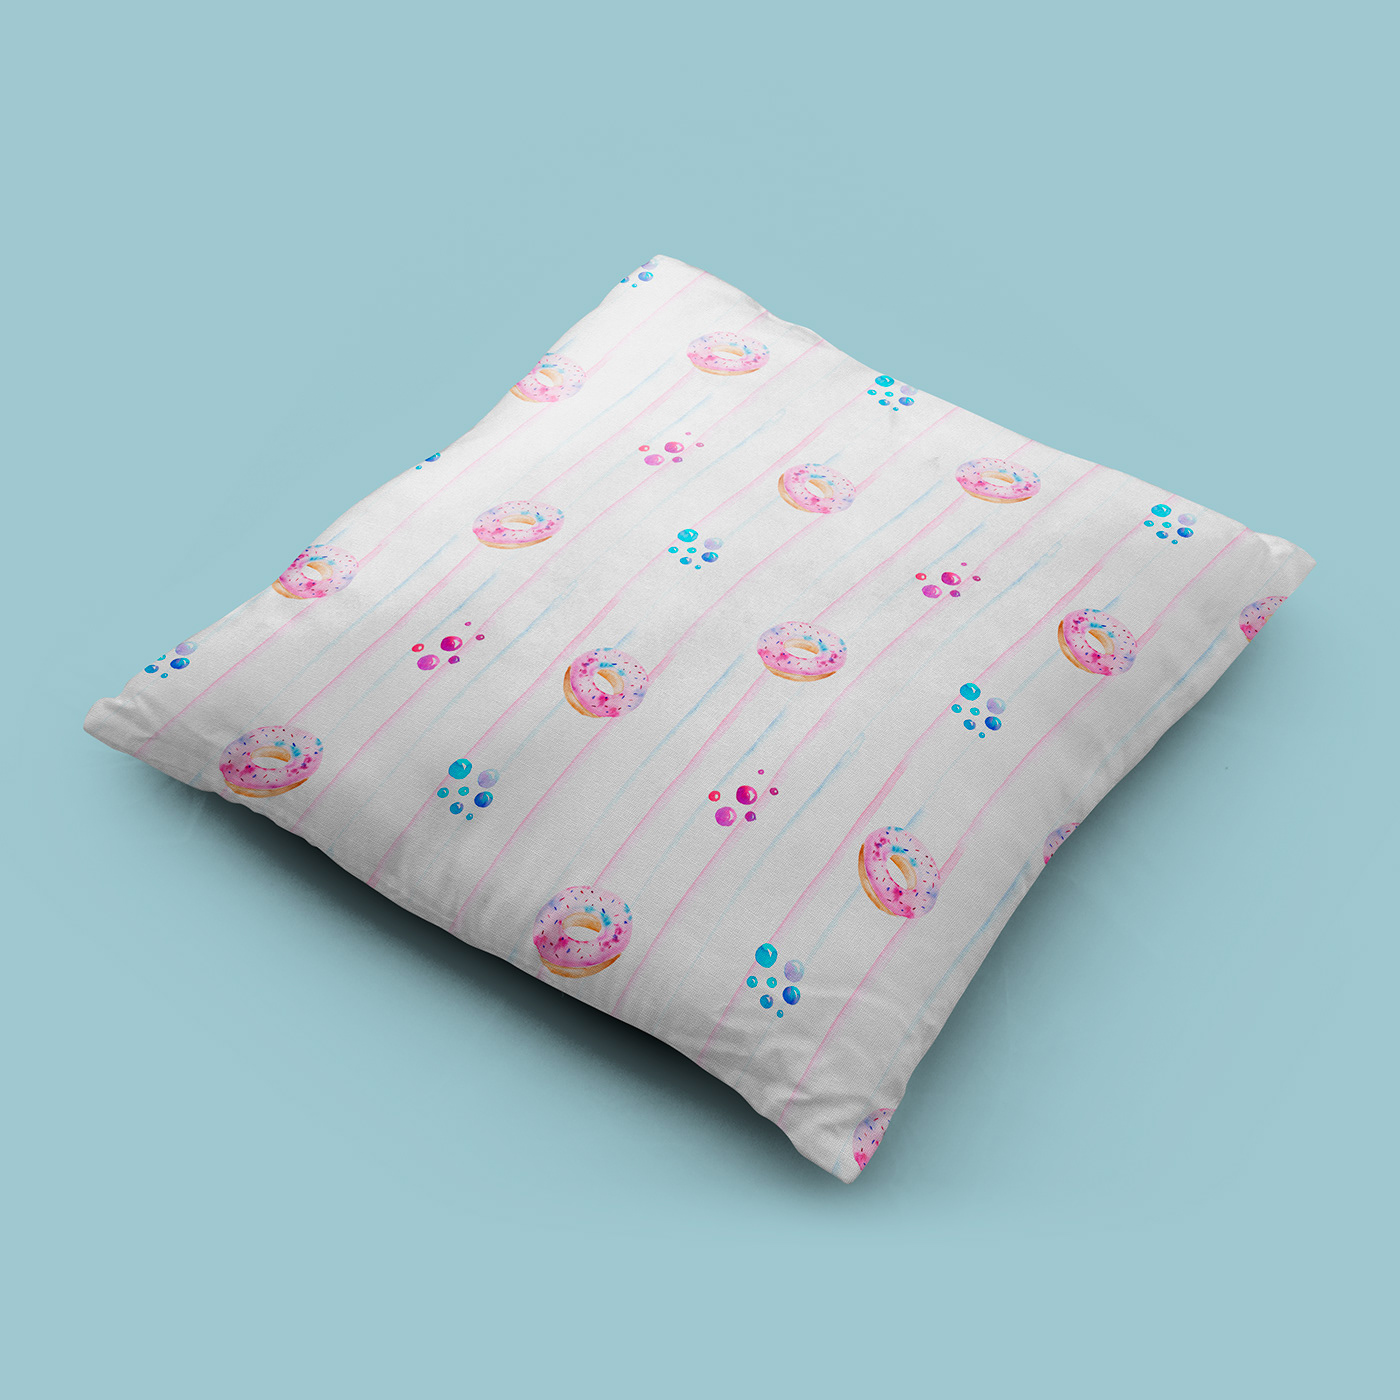 branding  cushion Mockup decorative high resolution mock-up Pillow Mockup throw pillow square pillow free mockup